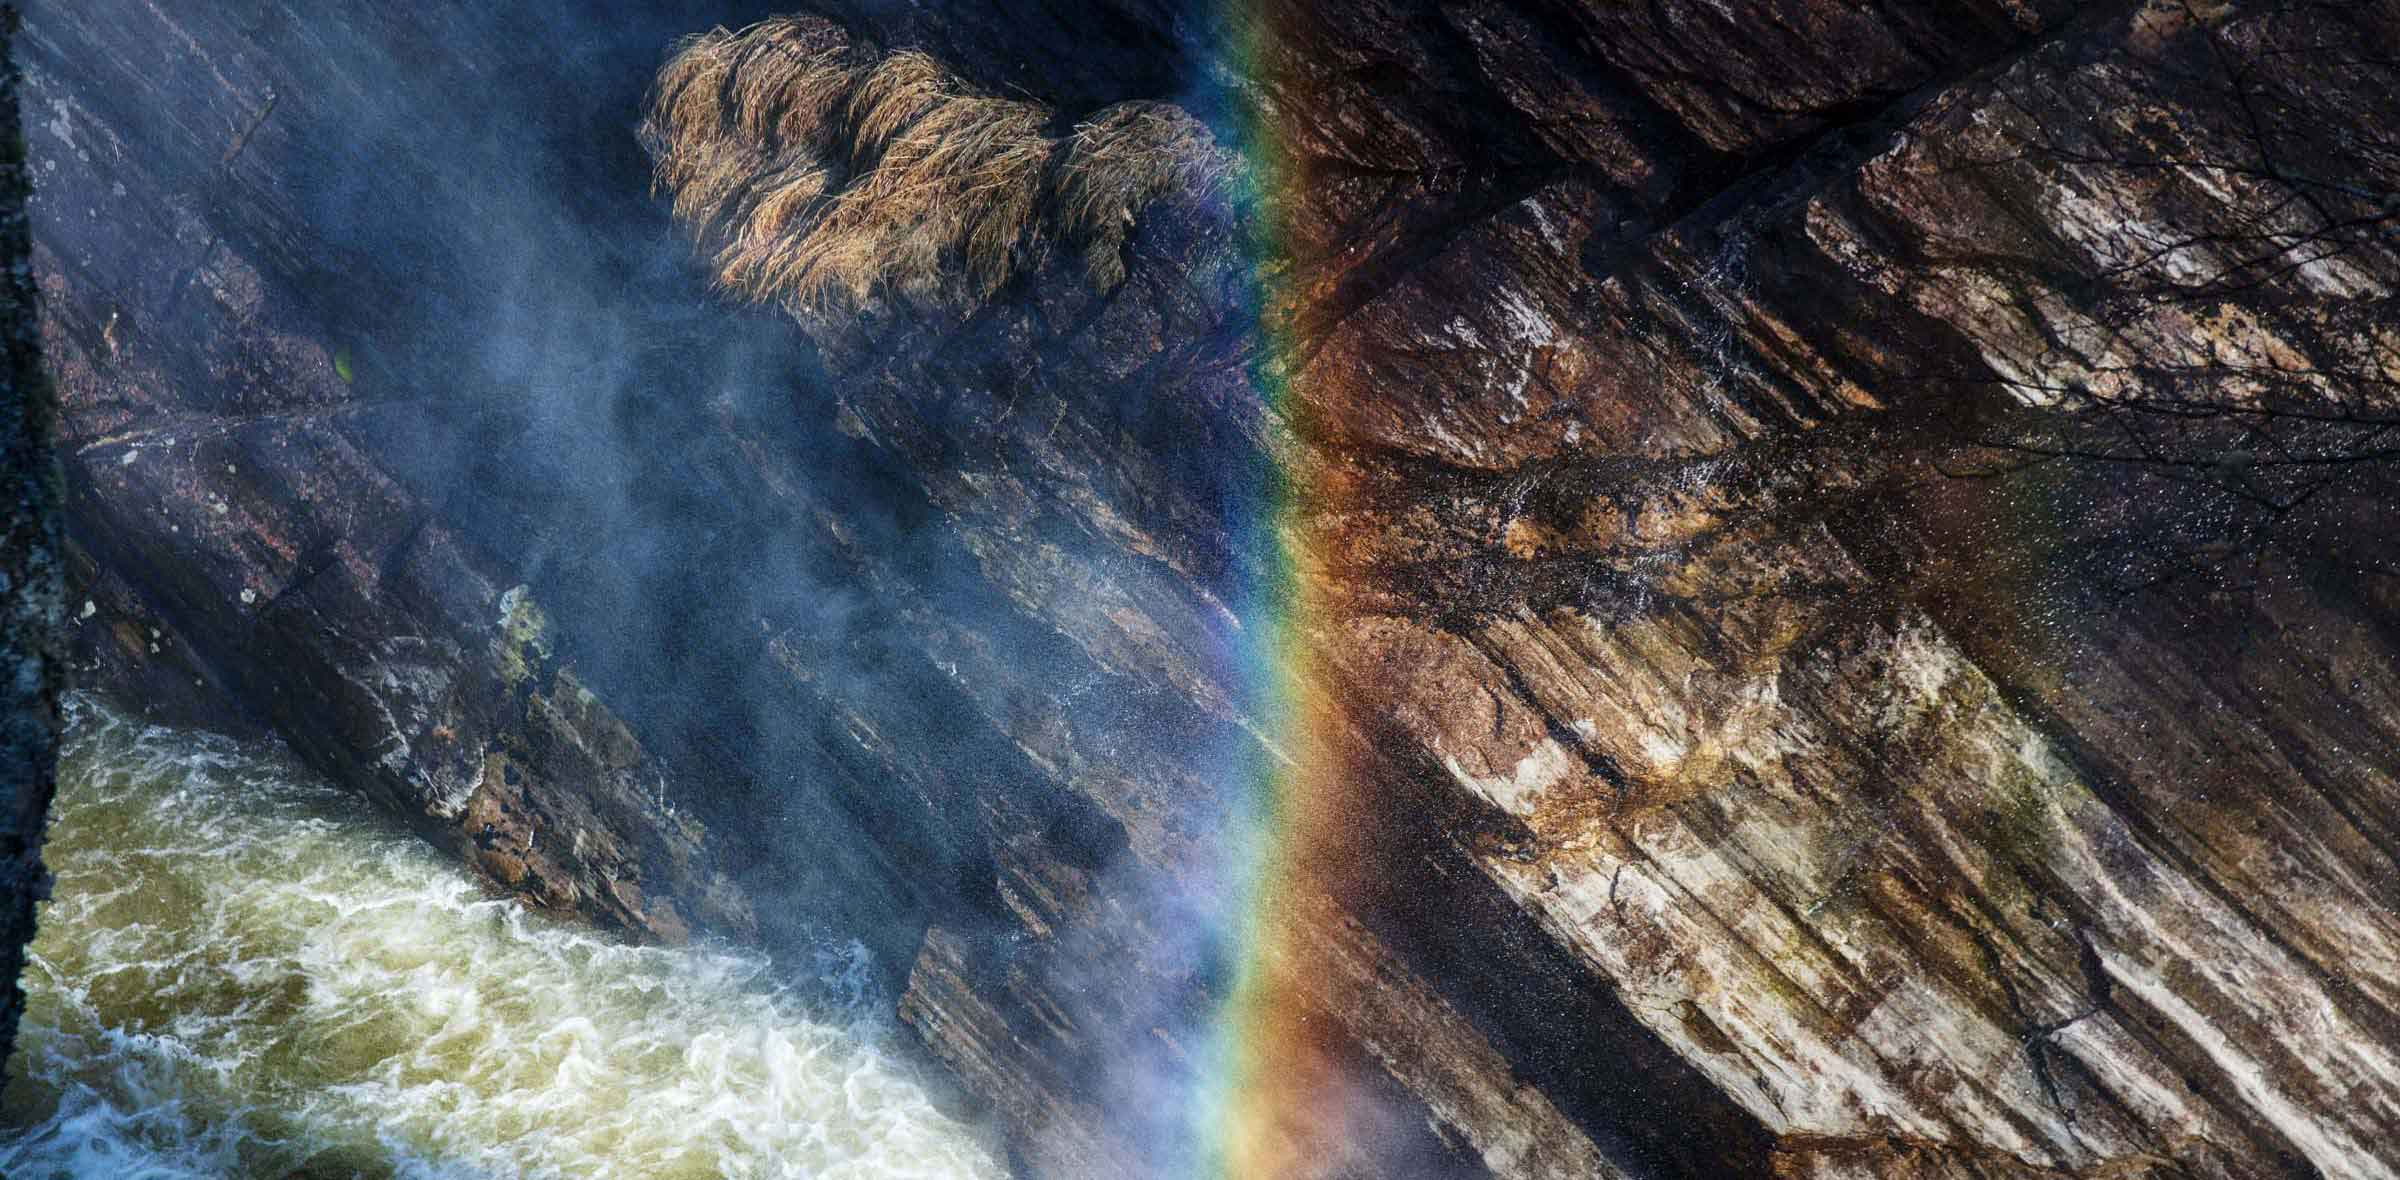 Et naturbilde fra skiferbruddet Otta Pillarguri. Skiferen er rustfarget og en regnbue dannes fra elven under berget.